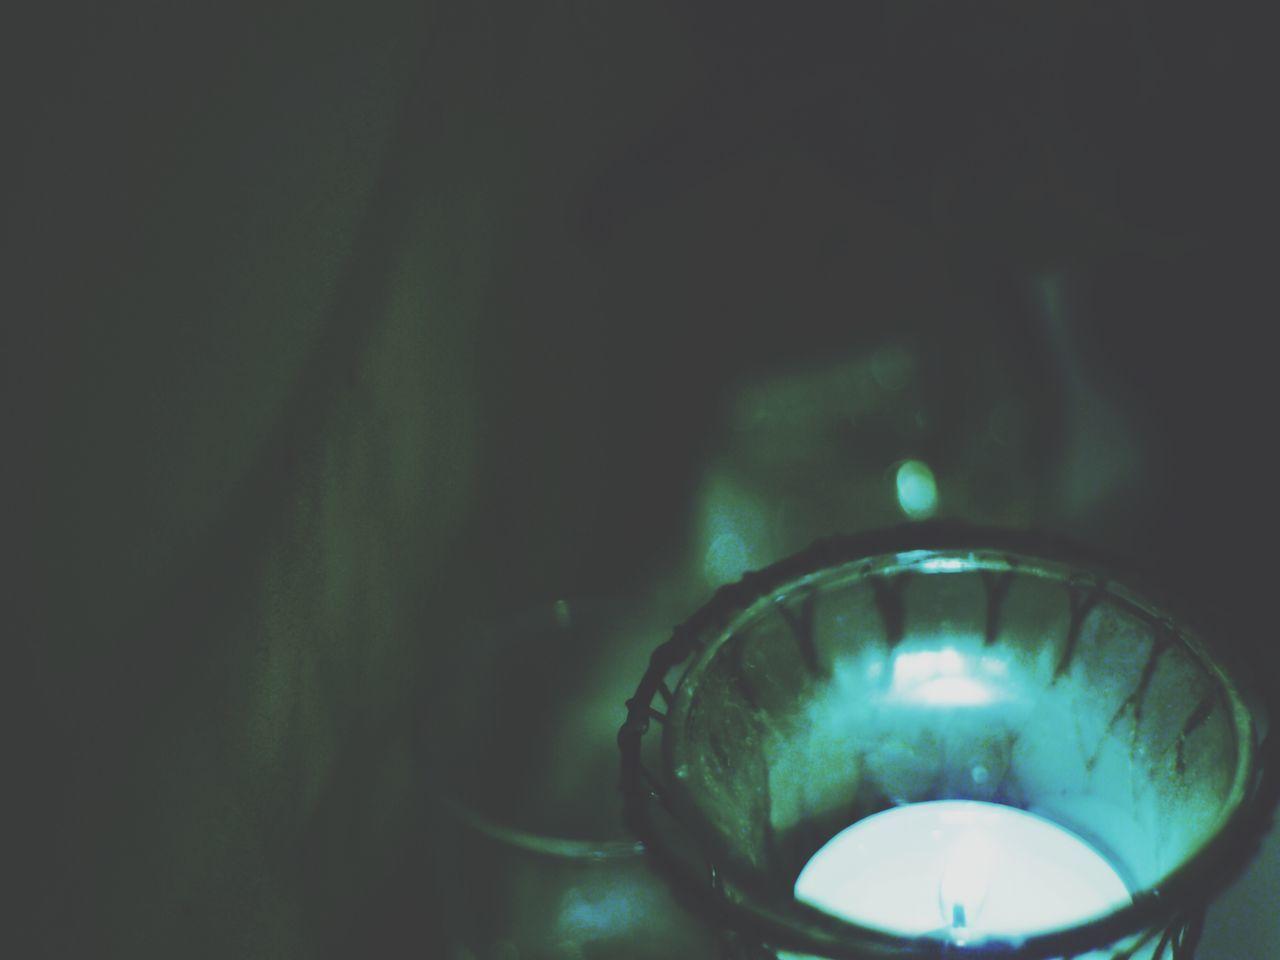 Light And Shadow Darkness And Light Shadows & Lights Lights Shadows Lamp ろうそく 火 ランプ Shadow